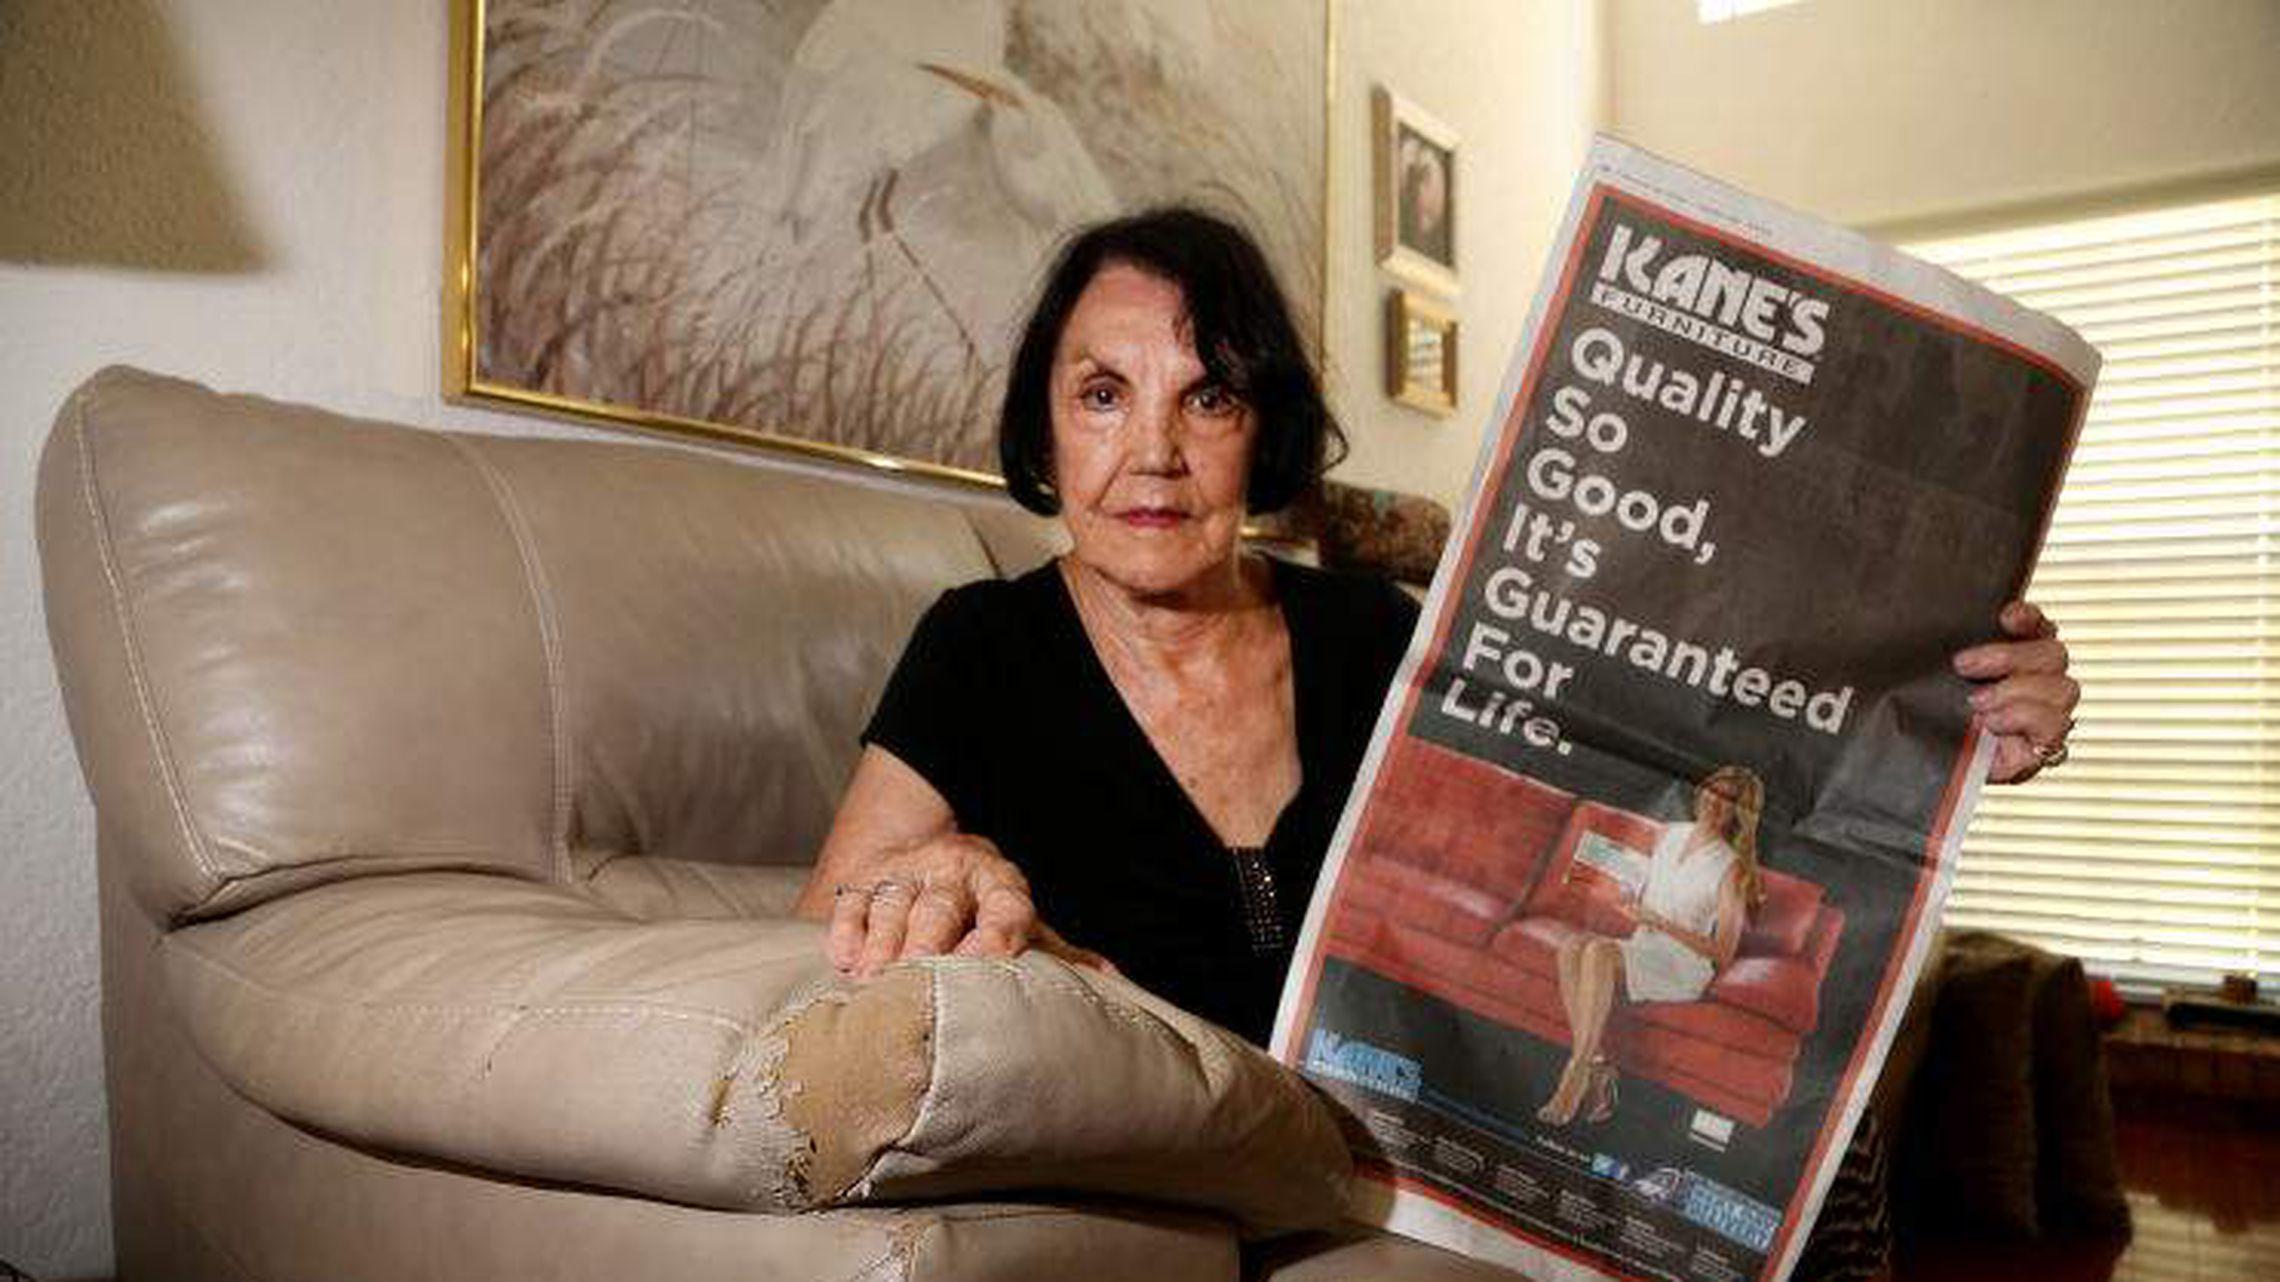 Kane S Fends Off Customer Complaints Of Cracking Peeling Furniture